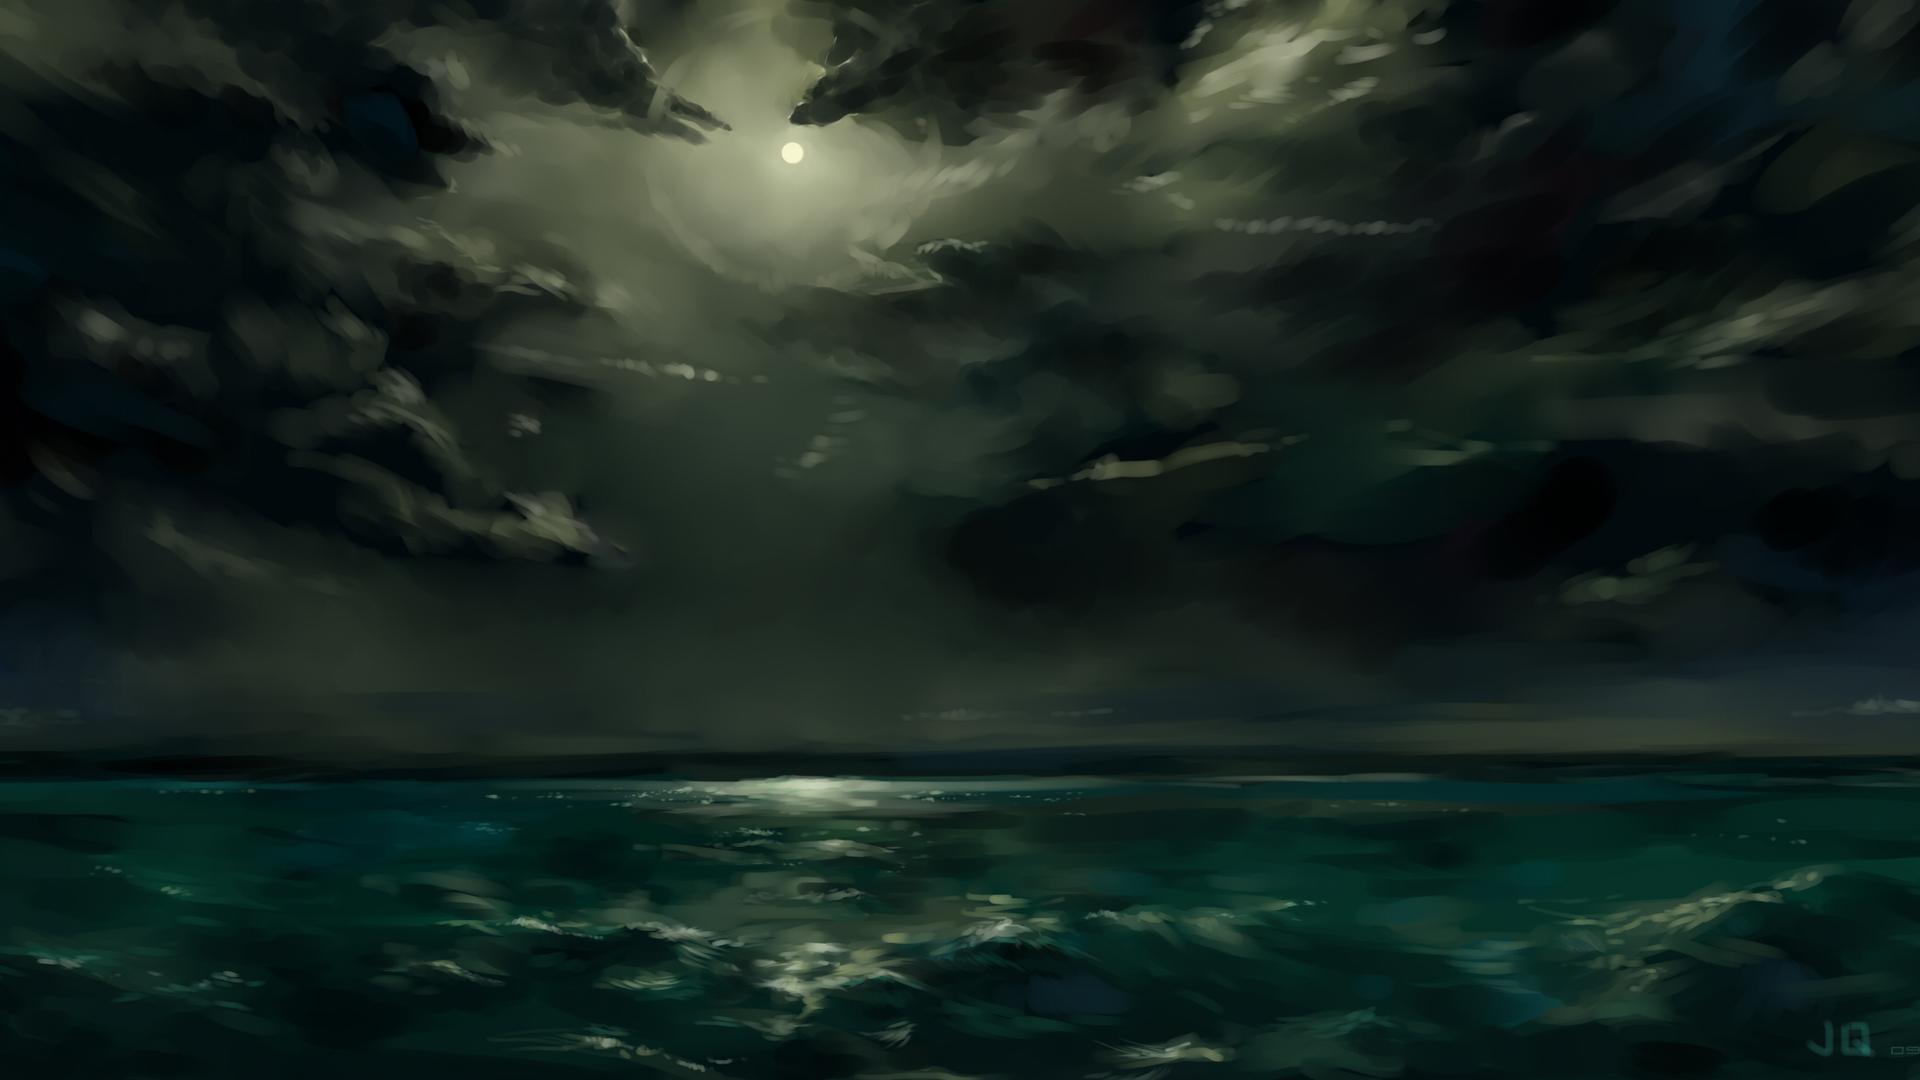 Clouds night storm sea wallpaper 1920x1080 217848 WallpaperUP 1920x1080